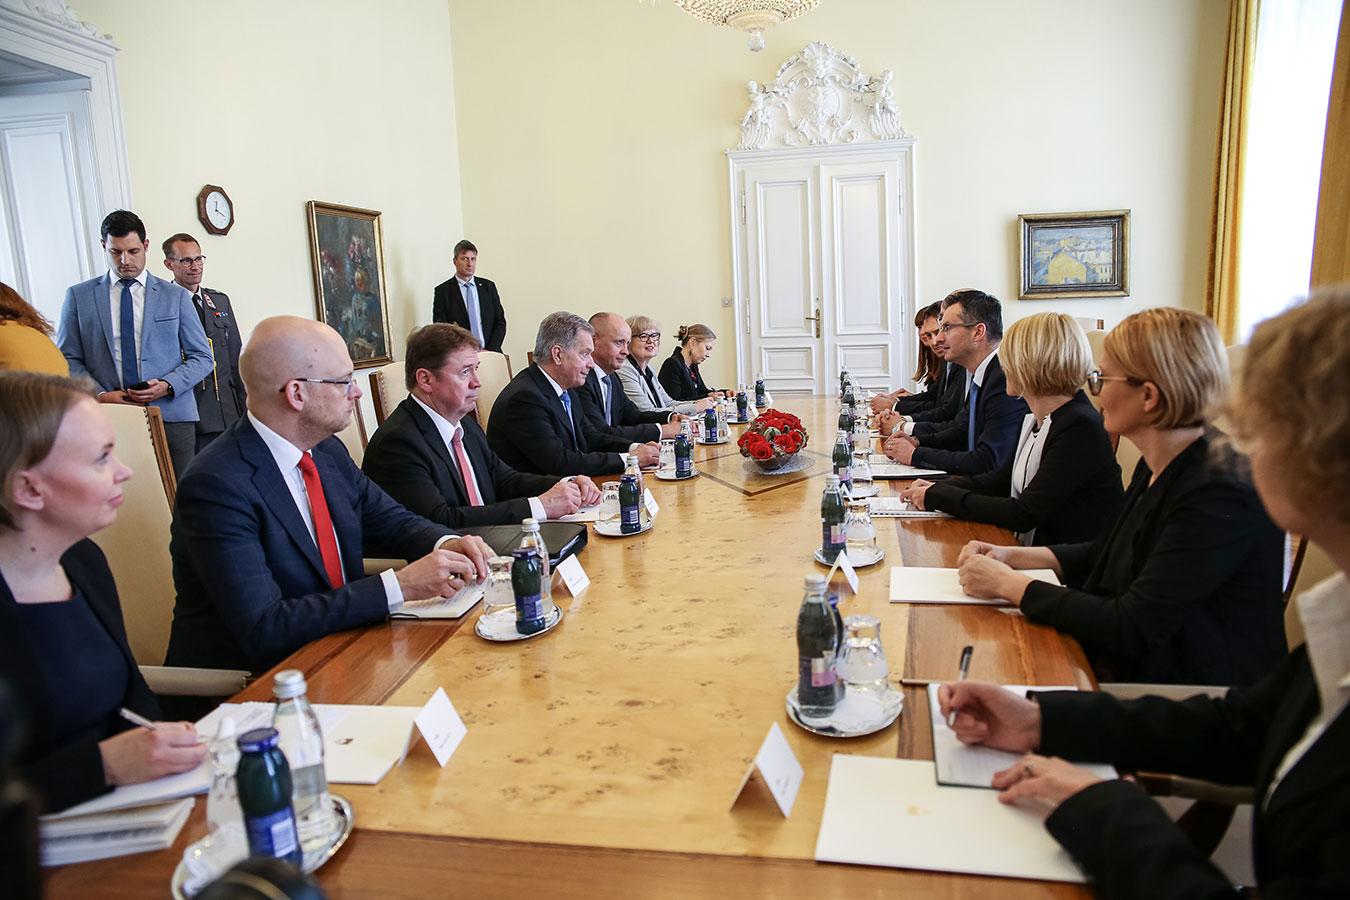 fin-markku-virri-finnish-president-slovenia-negotiation.jpg